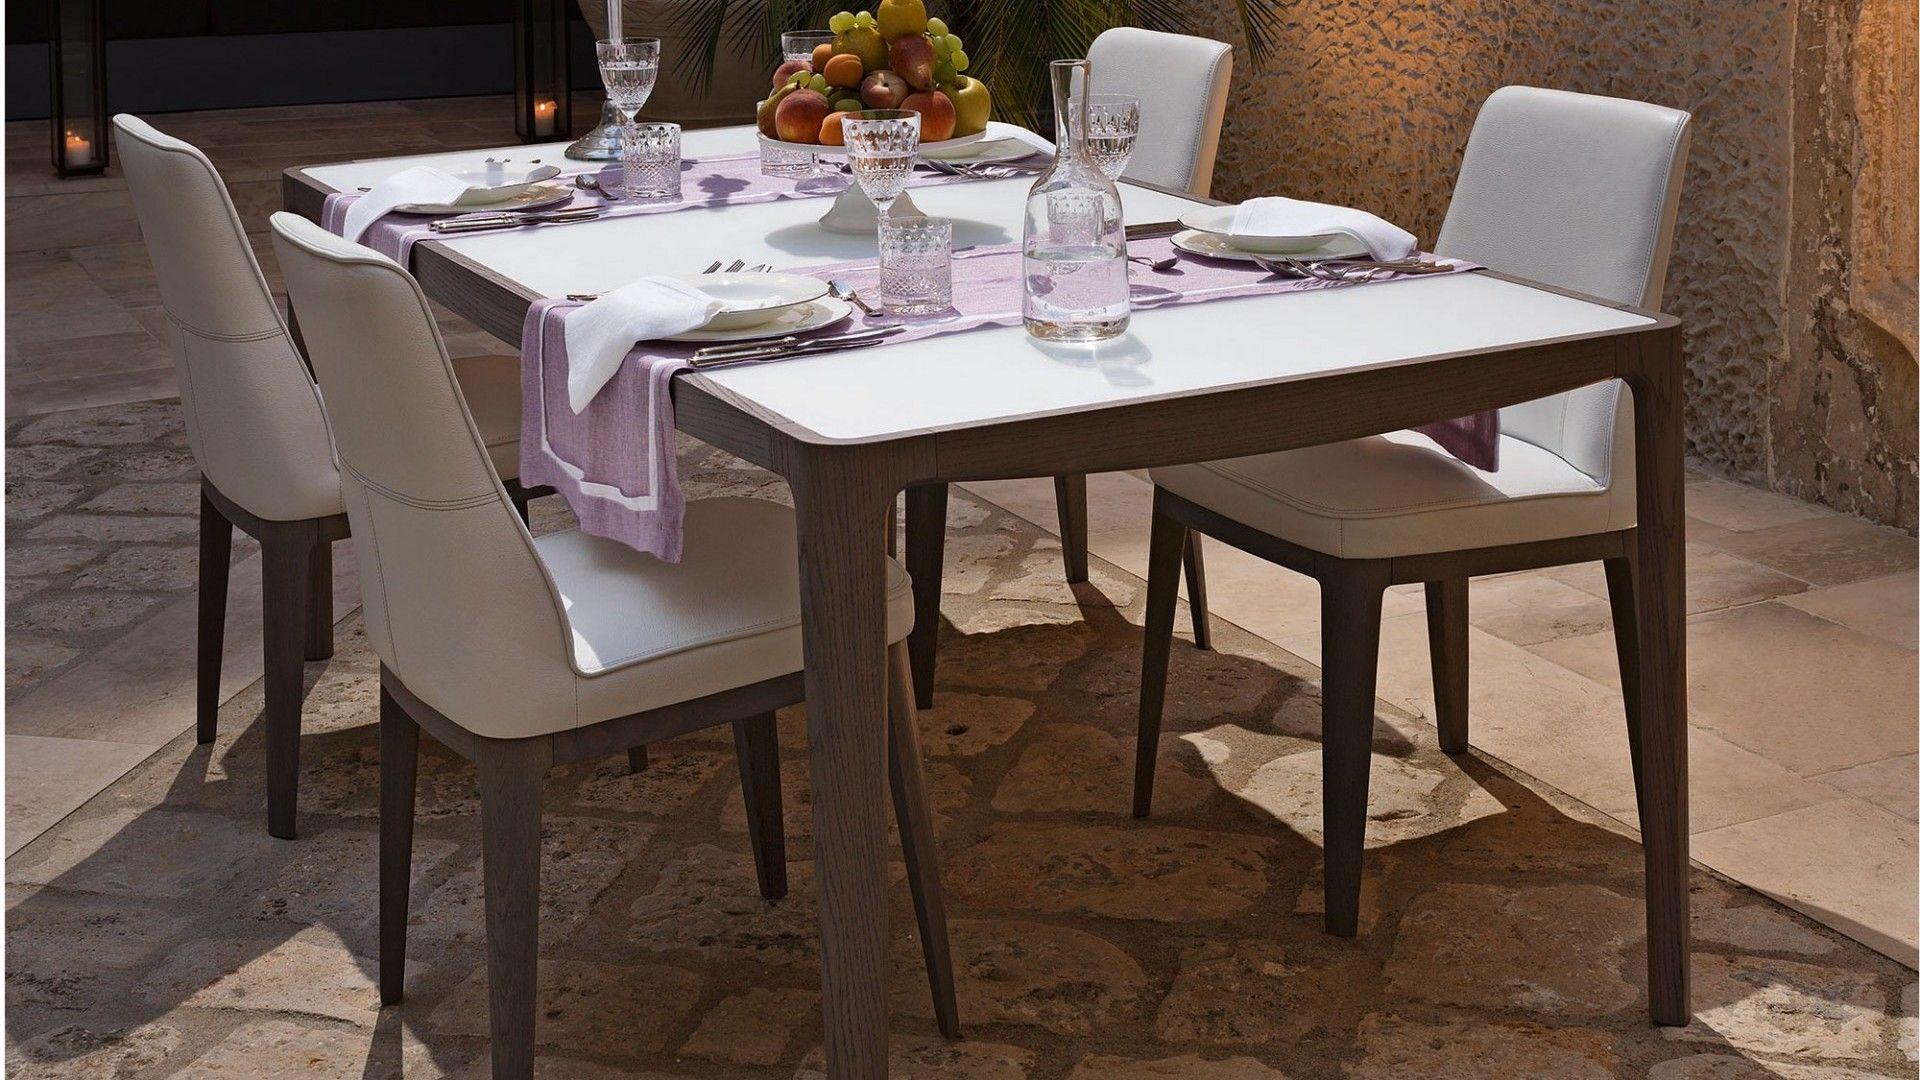 Natuzzi Italia Saturno Chairs Natuzzi Italia Philadelphia 321 South Street 215 515 3398 Natuzzi Night And Day Furniture Dining Table